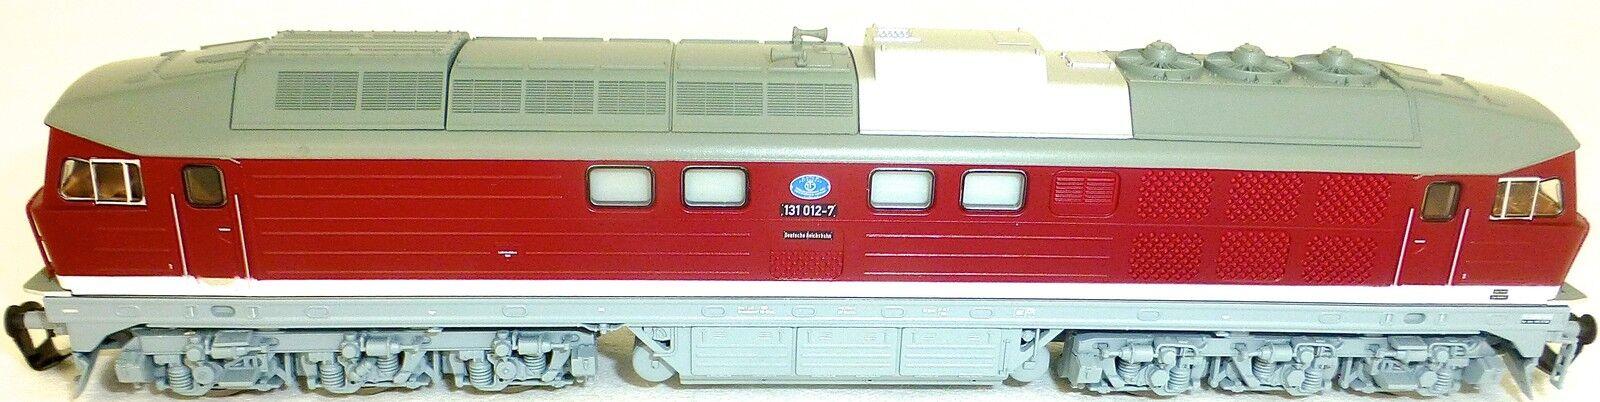 Piko 47321 2V 131 012 7 Locomotora Diésel Dr Epiv Dss PluX16 Tt 1 120 Nuevo Ovp